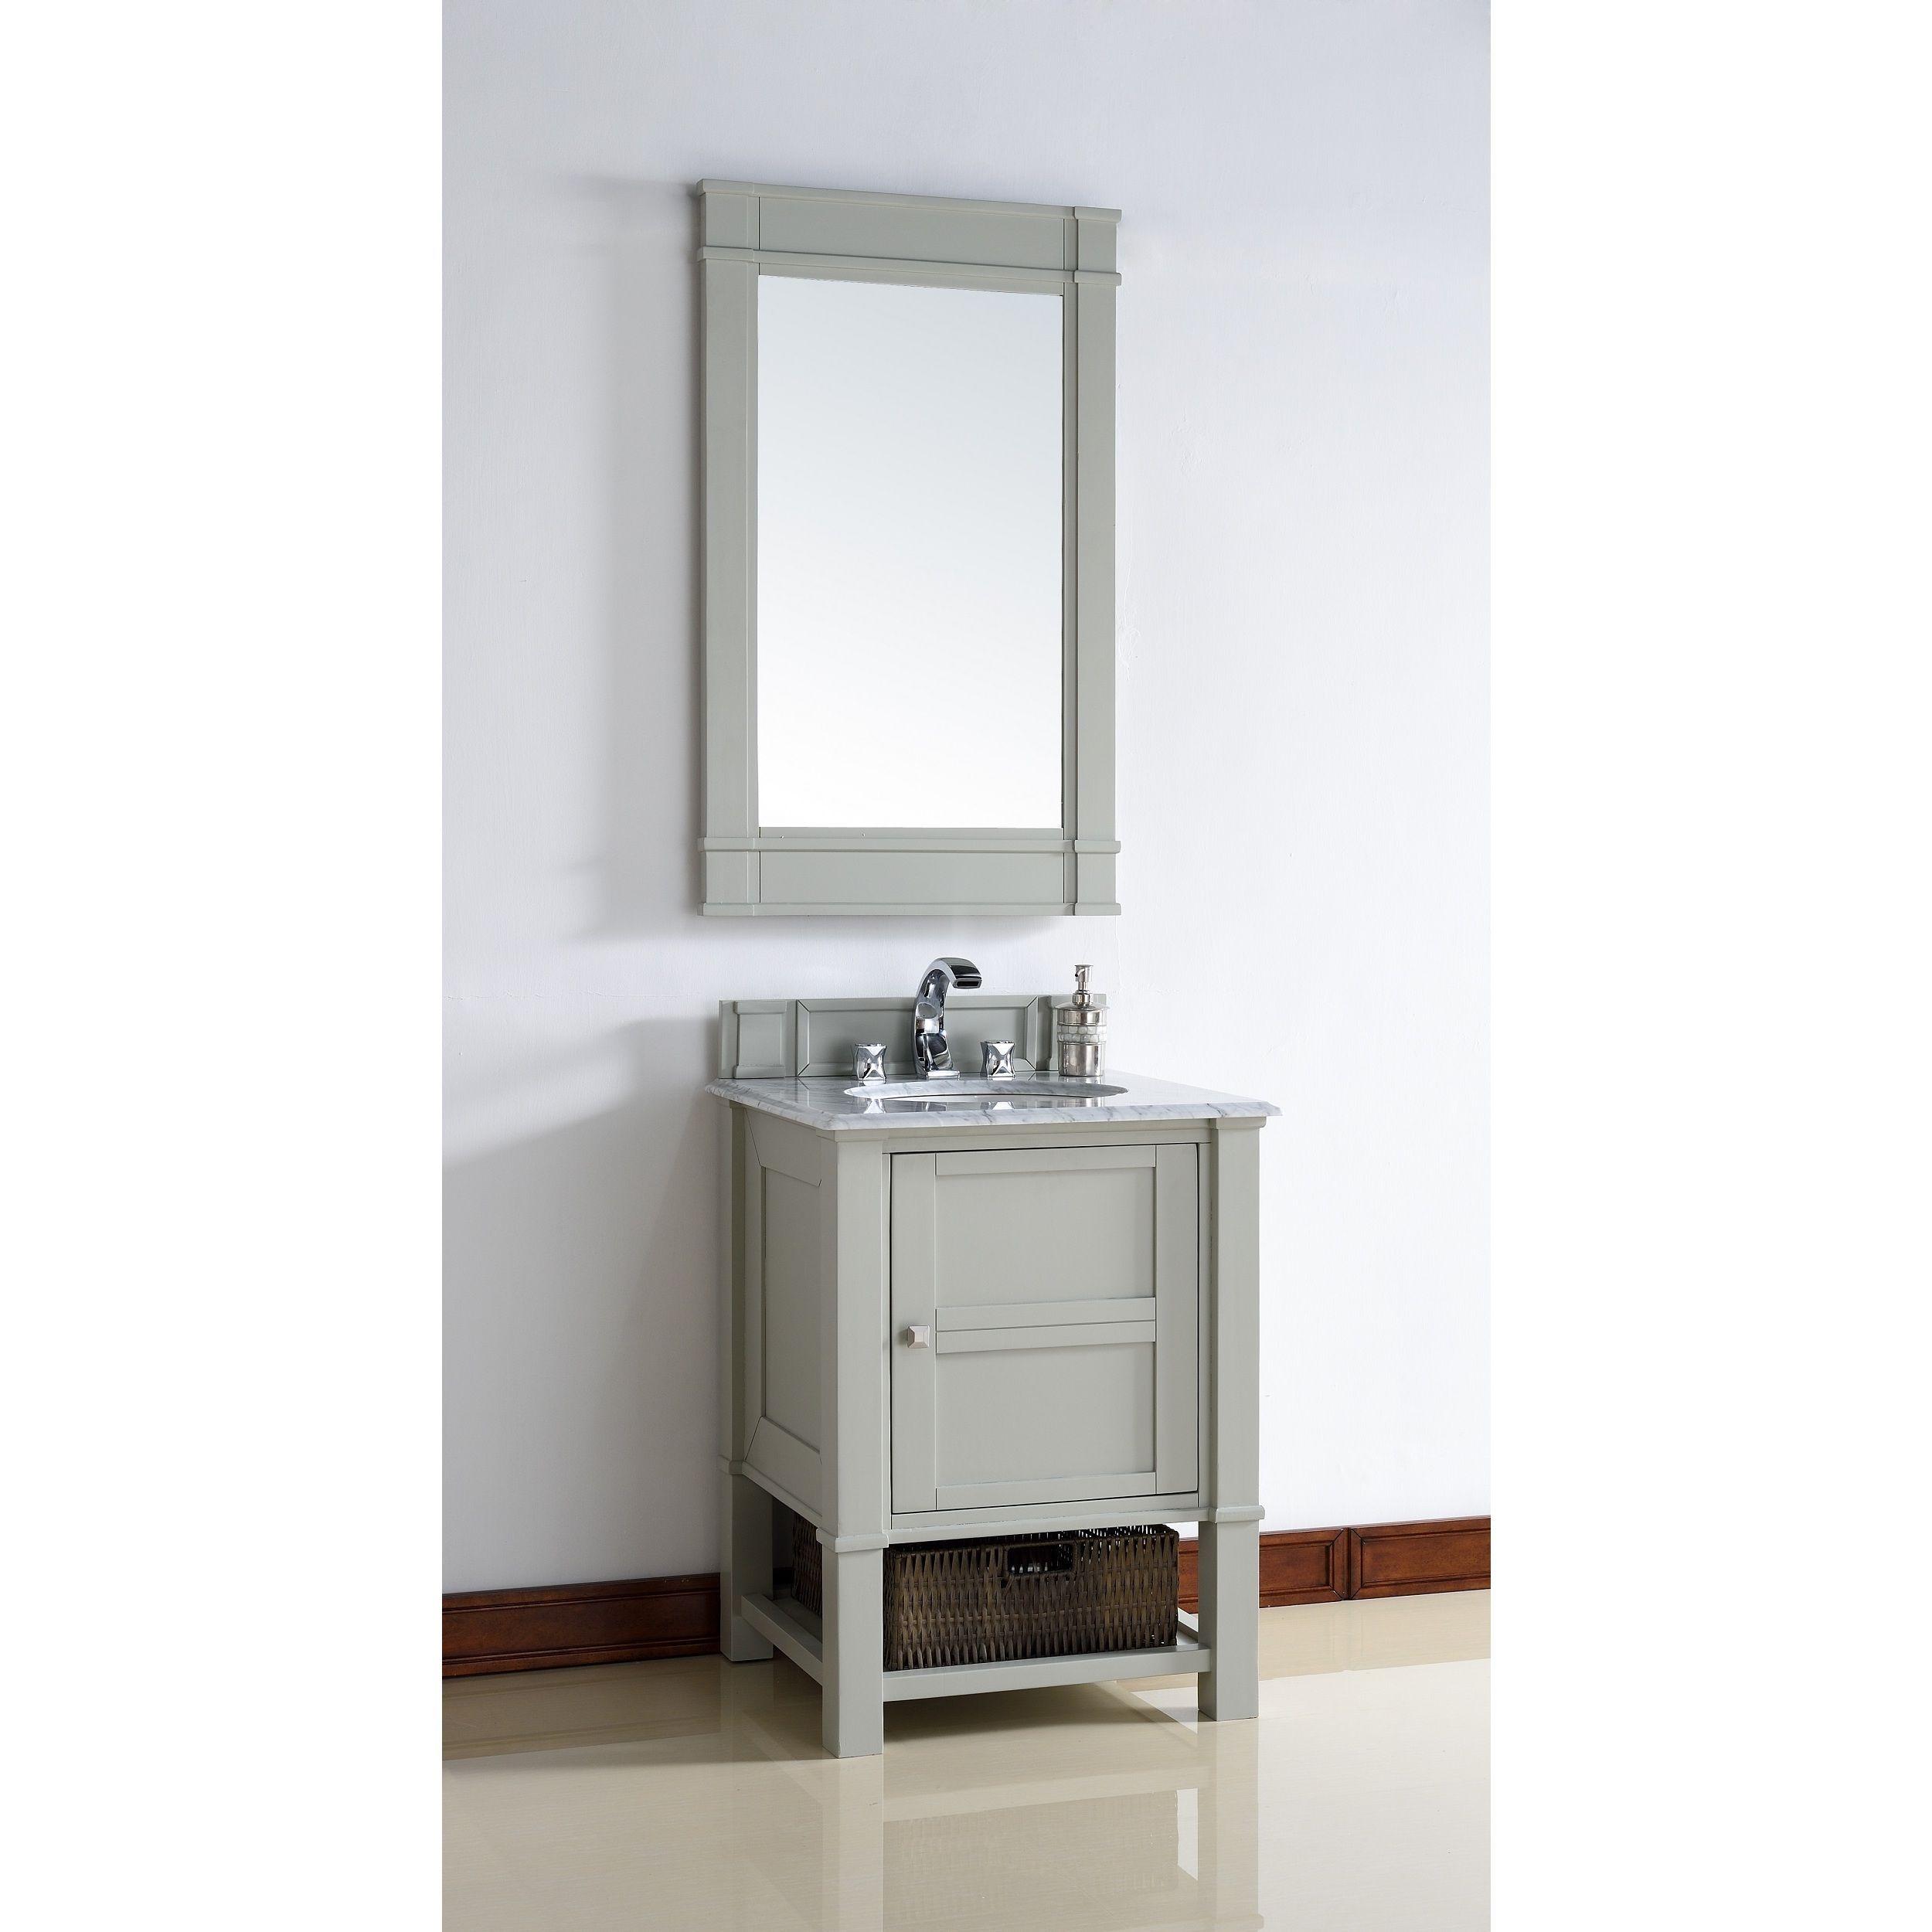 gallery inch big counter delaware kris l bathroom images vanity